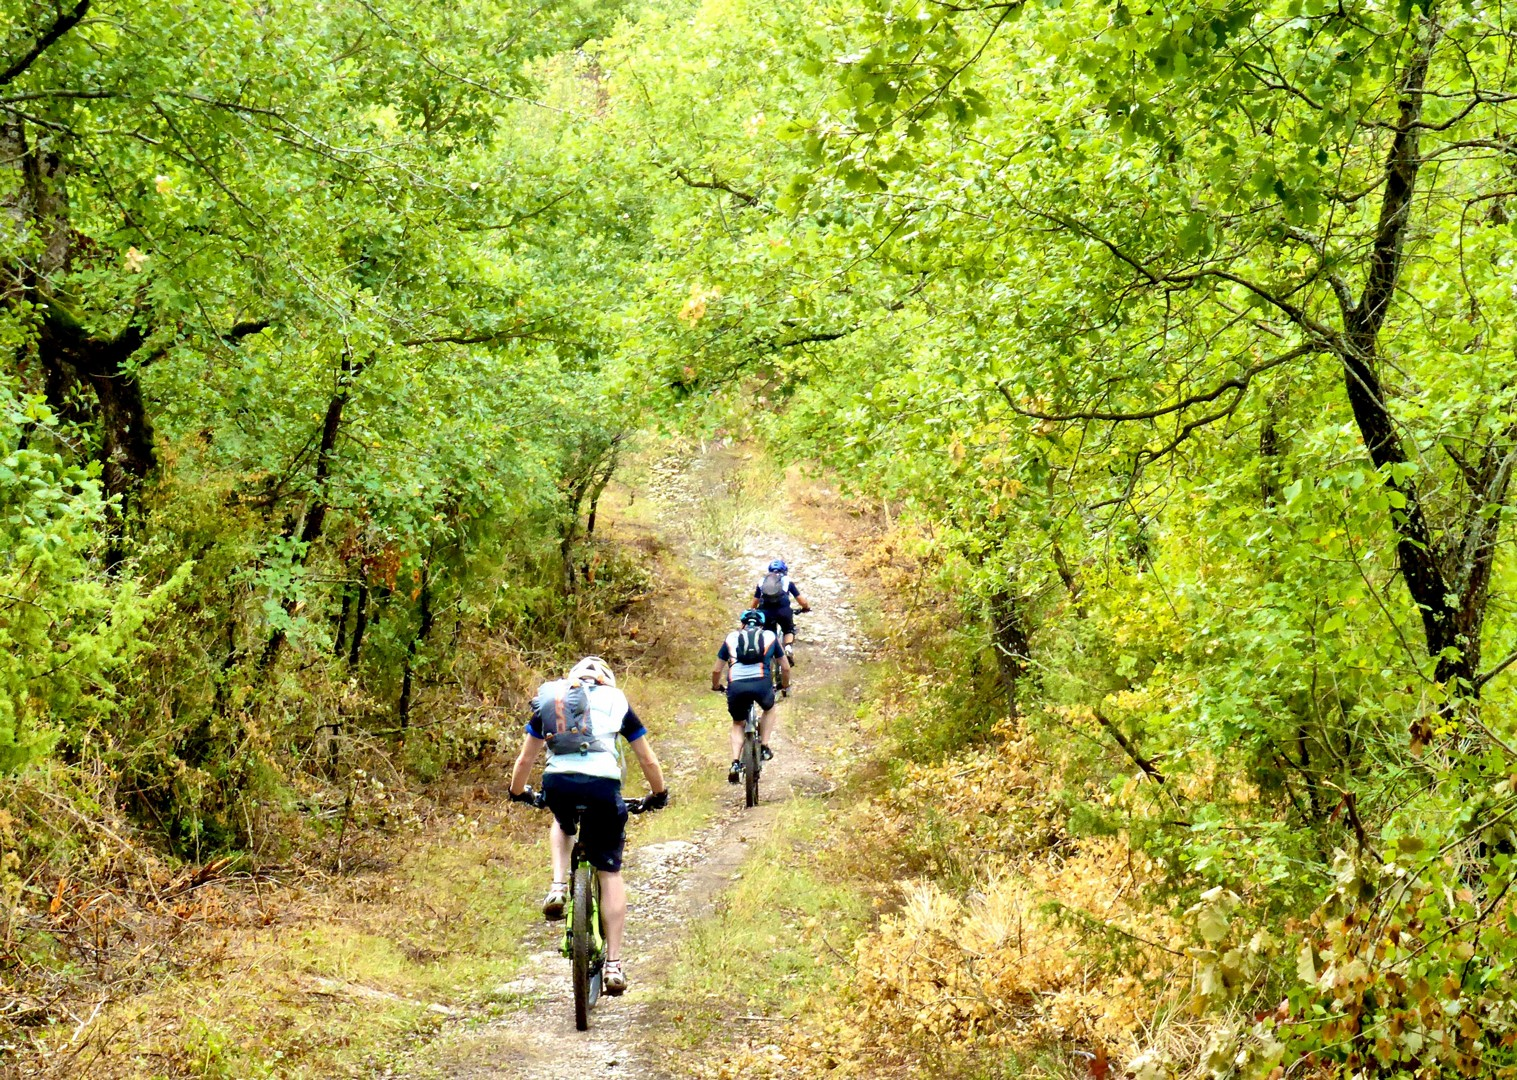 self-guided-mountain-bike-saddle-skedaddle-italy-tuscany-to-rome.jpg - Italy - Via Francigena (Tuscany to Rome) - Self-Guided Mountain Bike Holiday - Mountain Biking